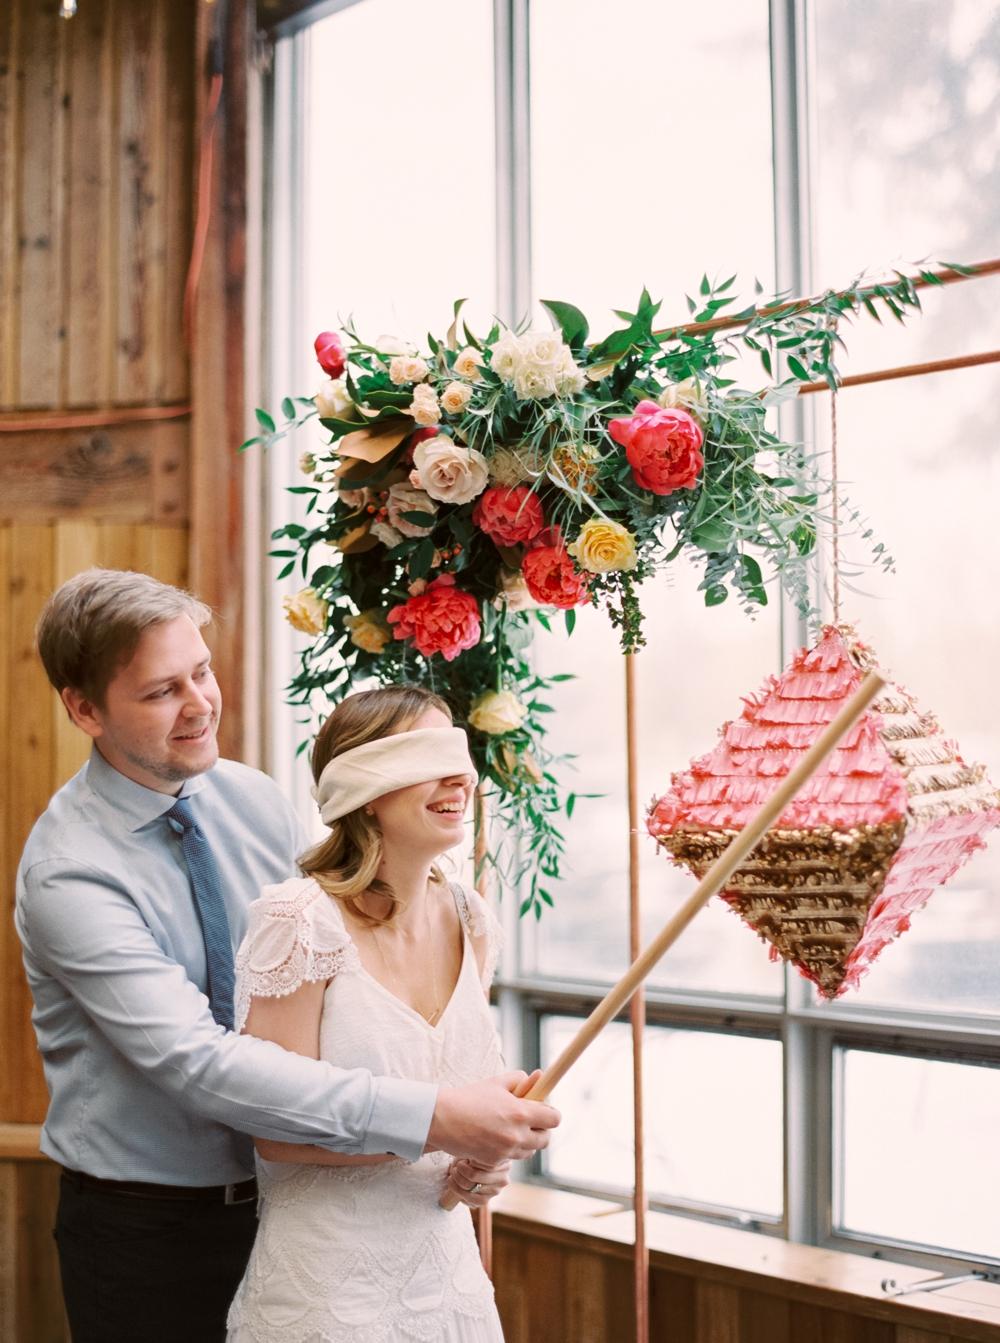 Calgary Zoo | Bohemian Wedding Style | Shannon Valente Weddings | Life Set Sail | Calgary Wedding Photographers